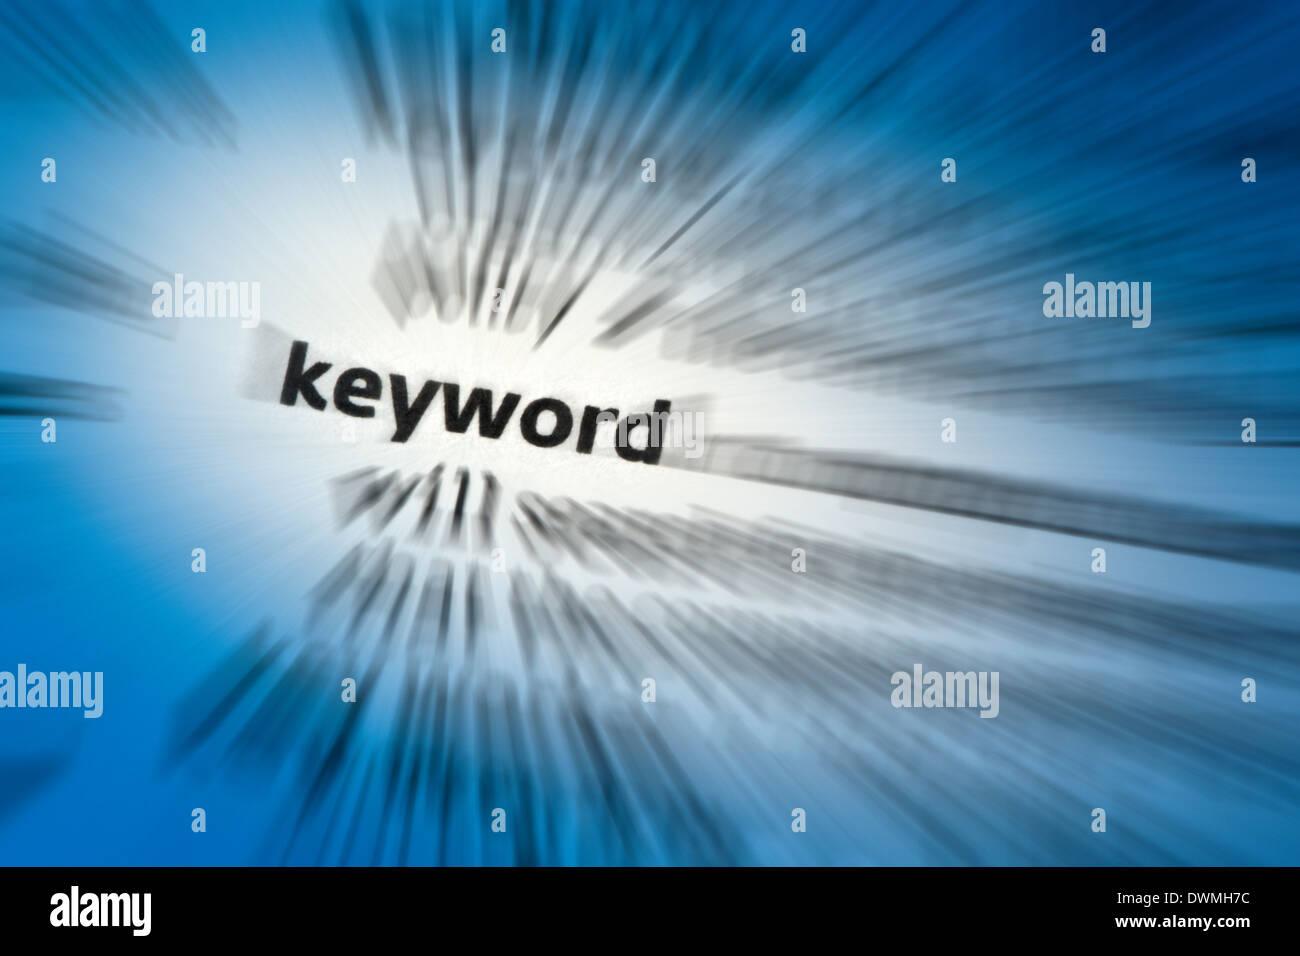 Keyword - Stock Image